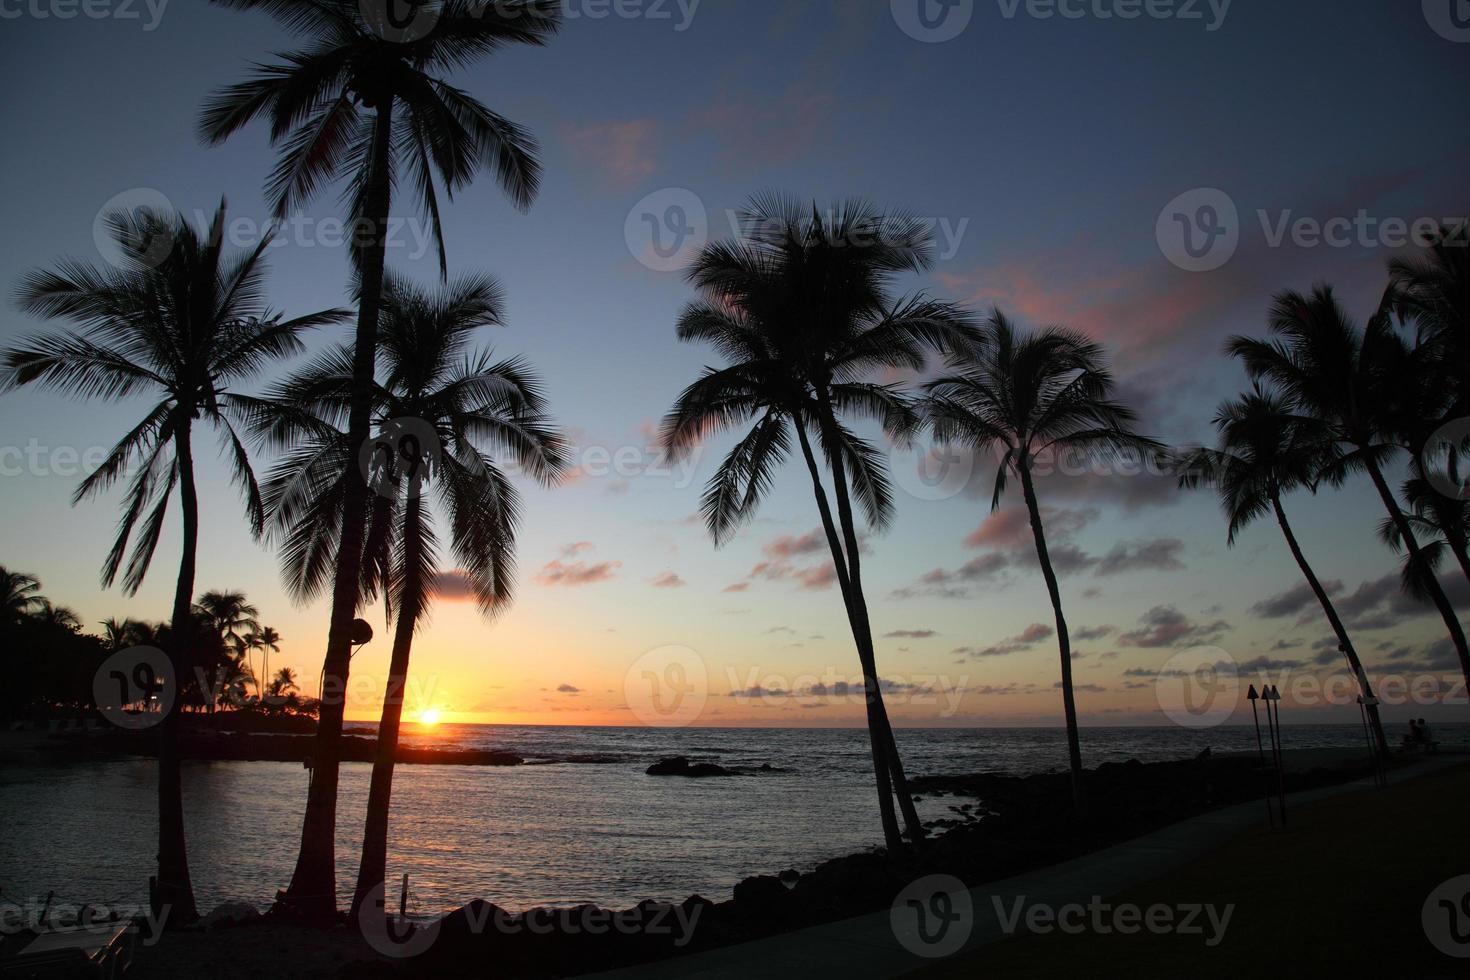 tramonto in hawaii foto